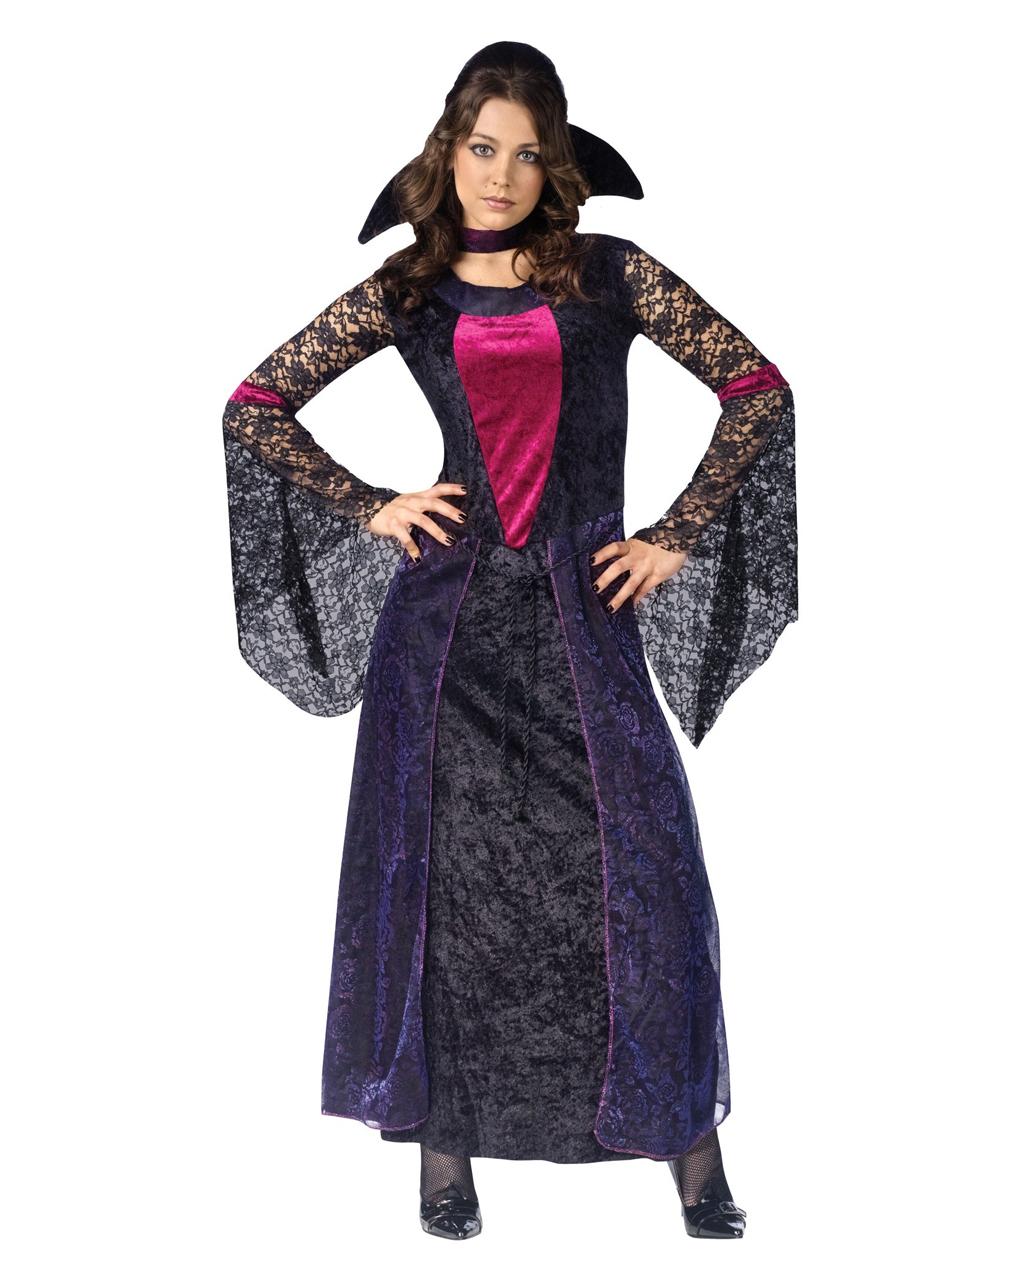 Halloween Costume 38.Vamptessa Costume 36 38 Sm